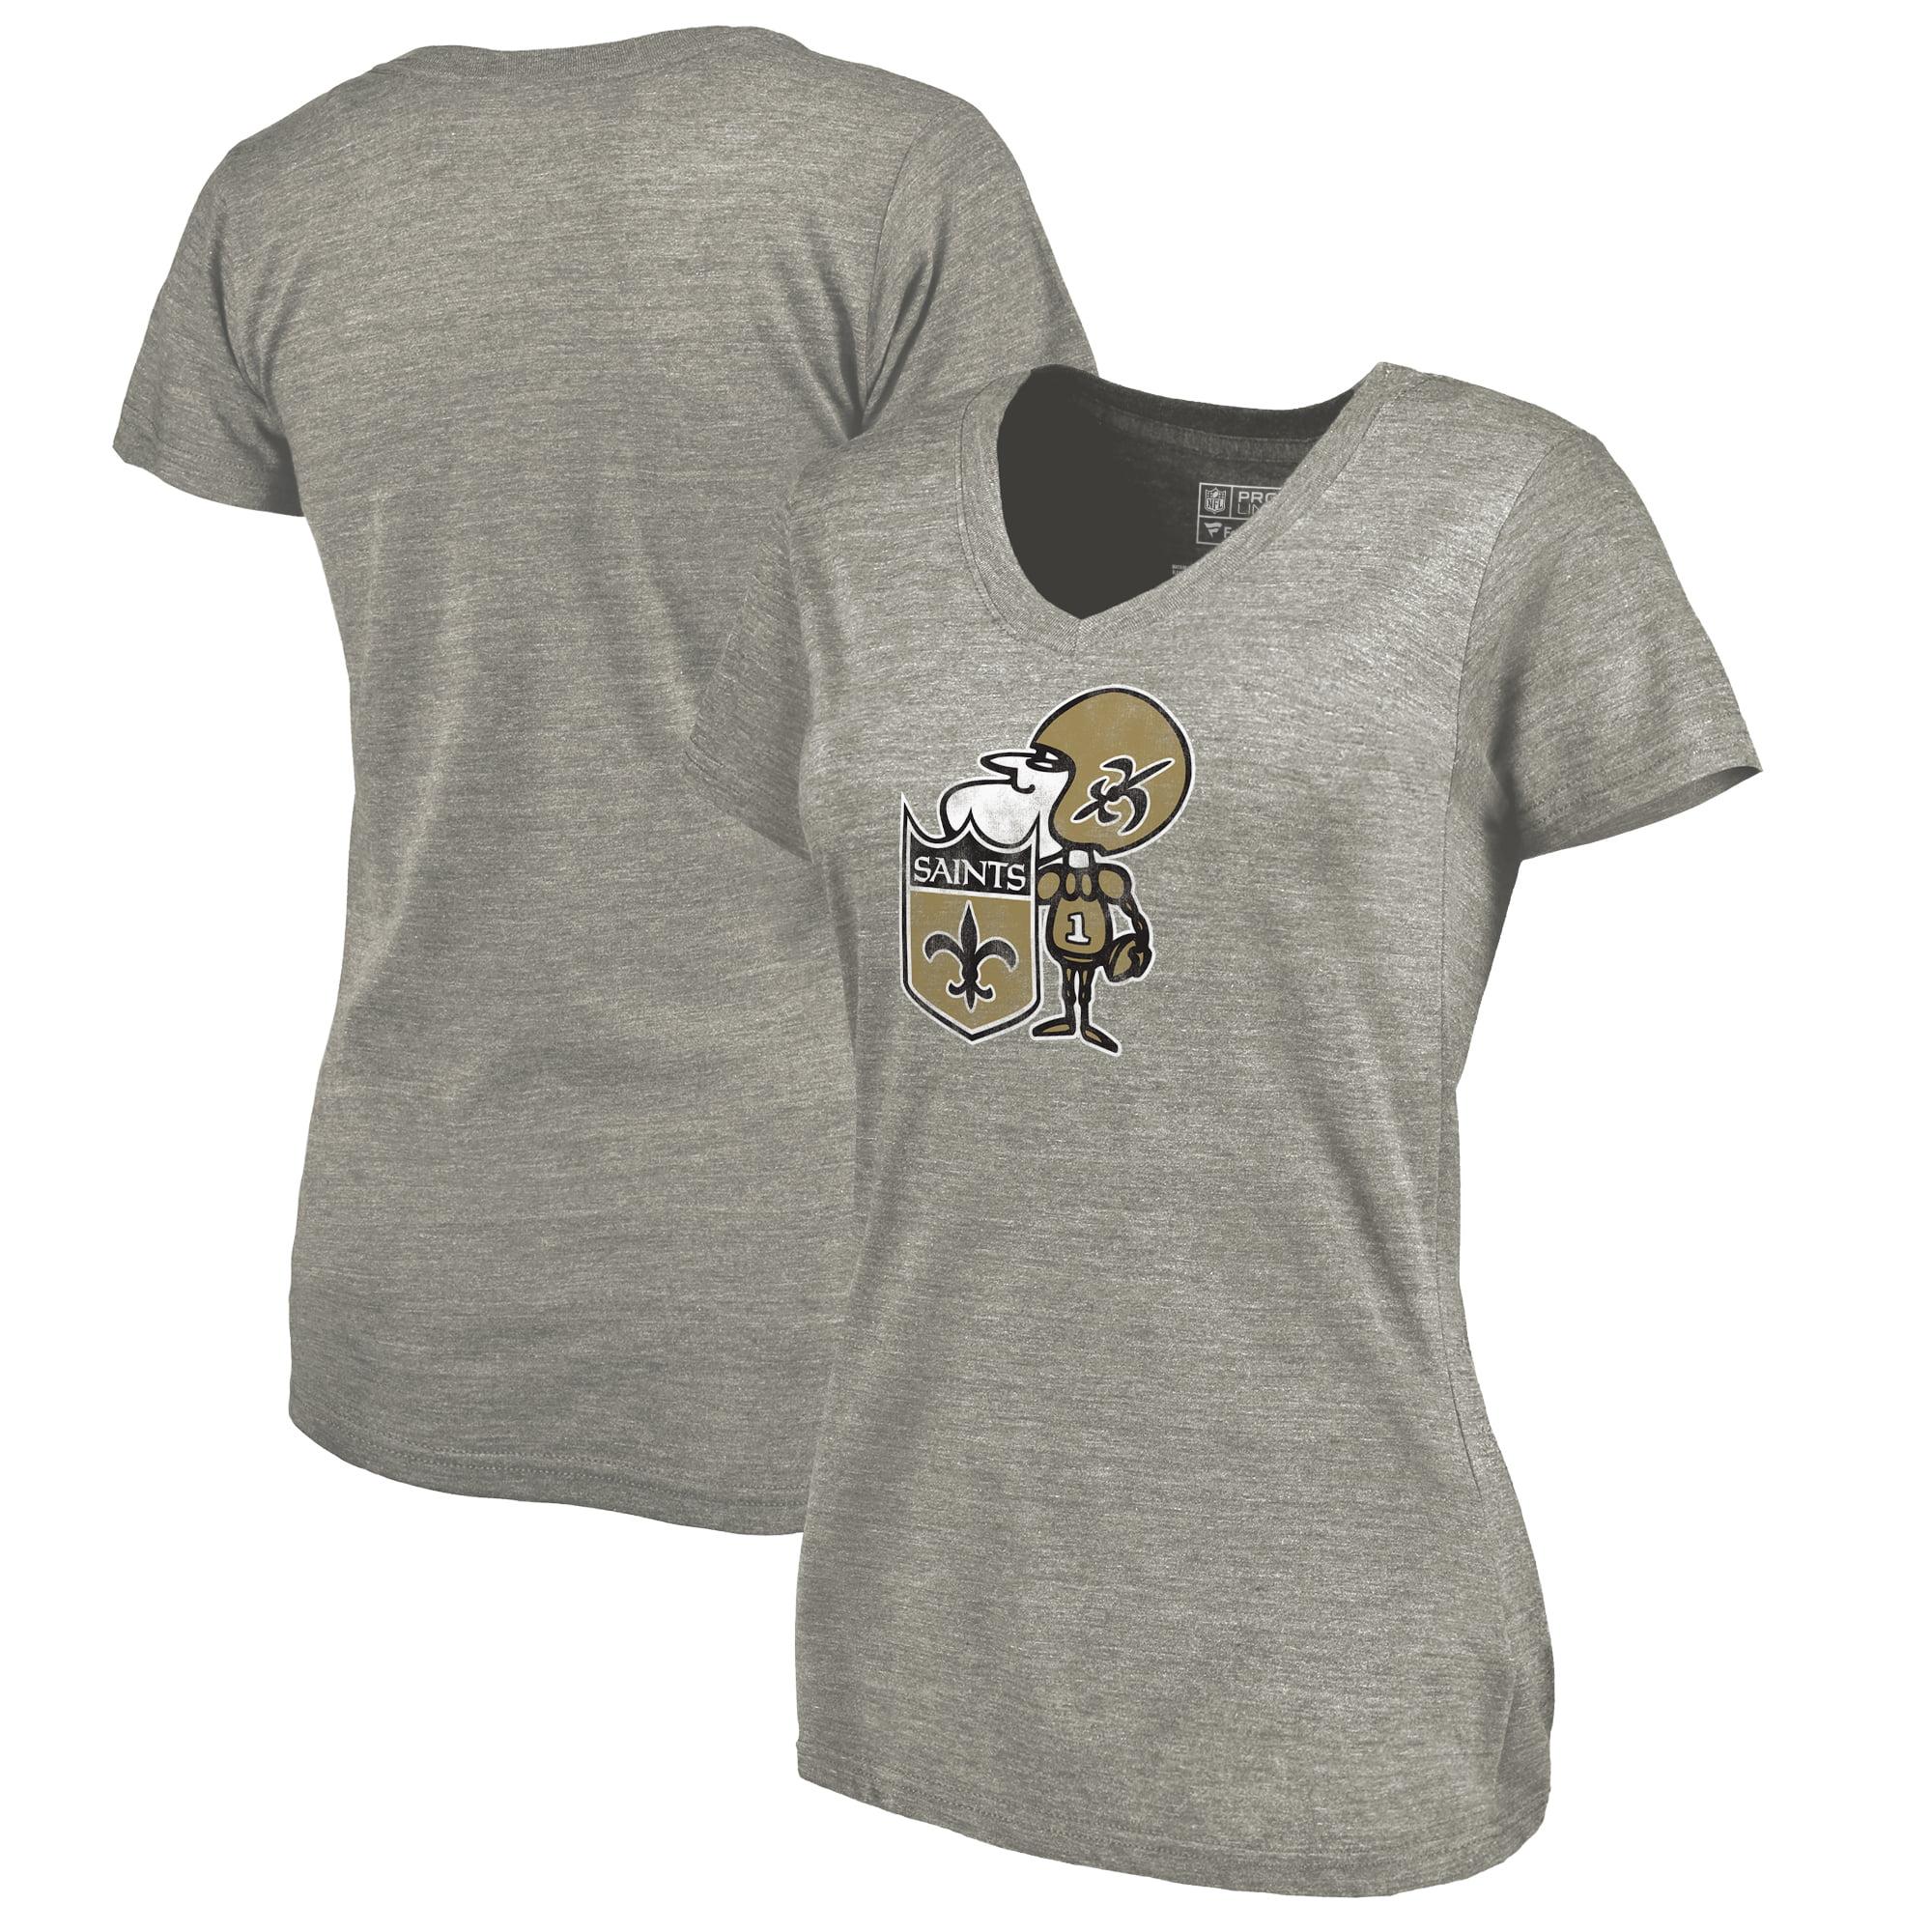 New Orleans Saints NFL Pro Line by Fanatics Branded Women's Throwback Logo Tri-Blend V-Neck T-Shirt - Ash